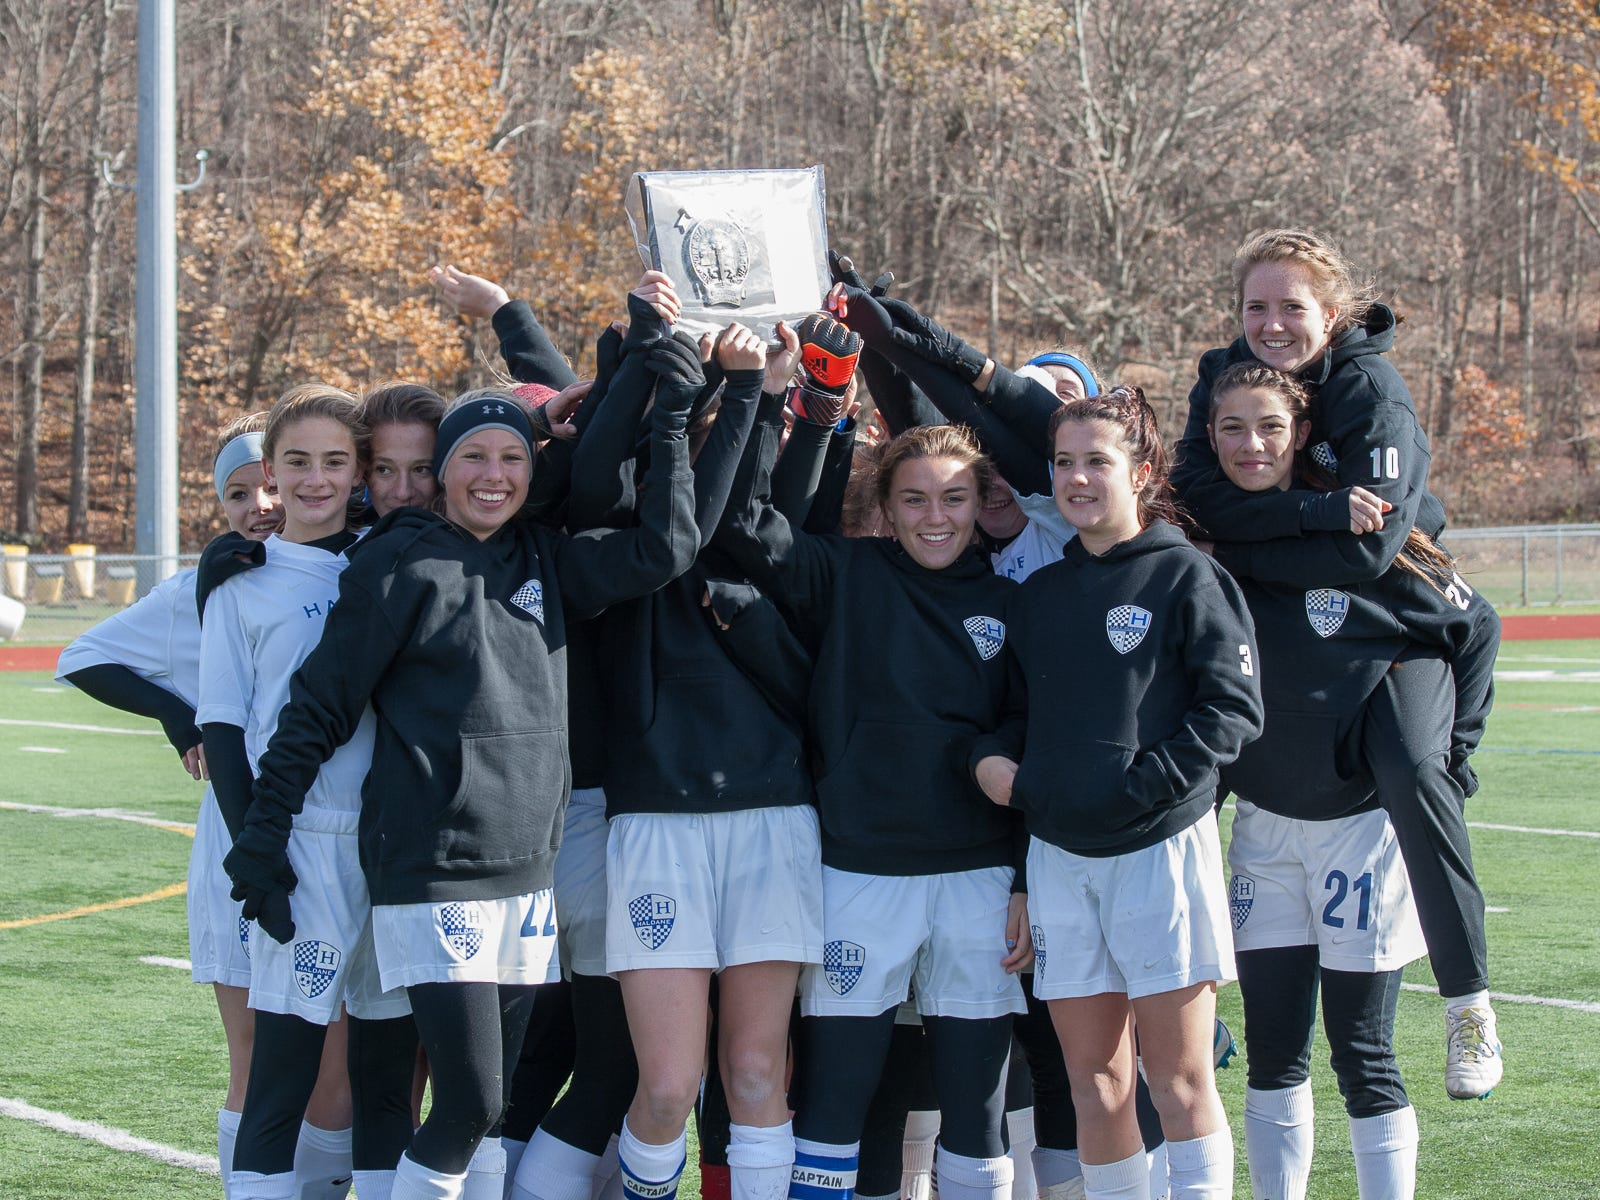 The Haldane High School girls soccer team celebrates its Section 1 Class C title at Arlington High School in Freedom Plains.